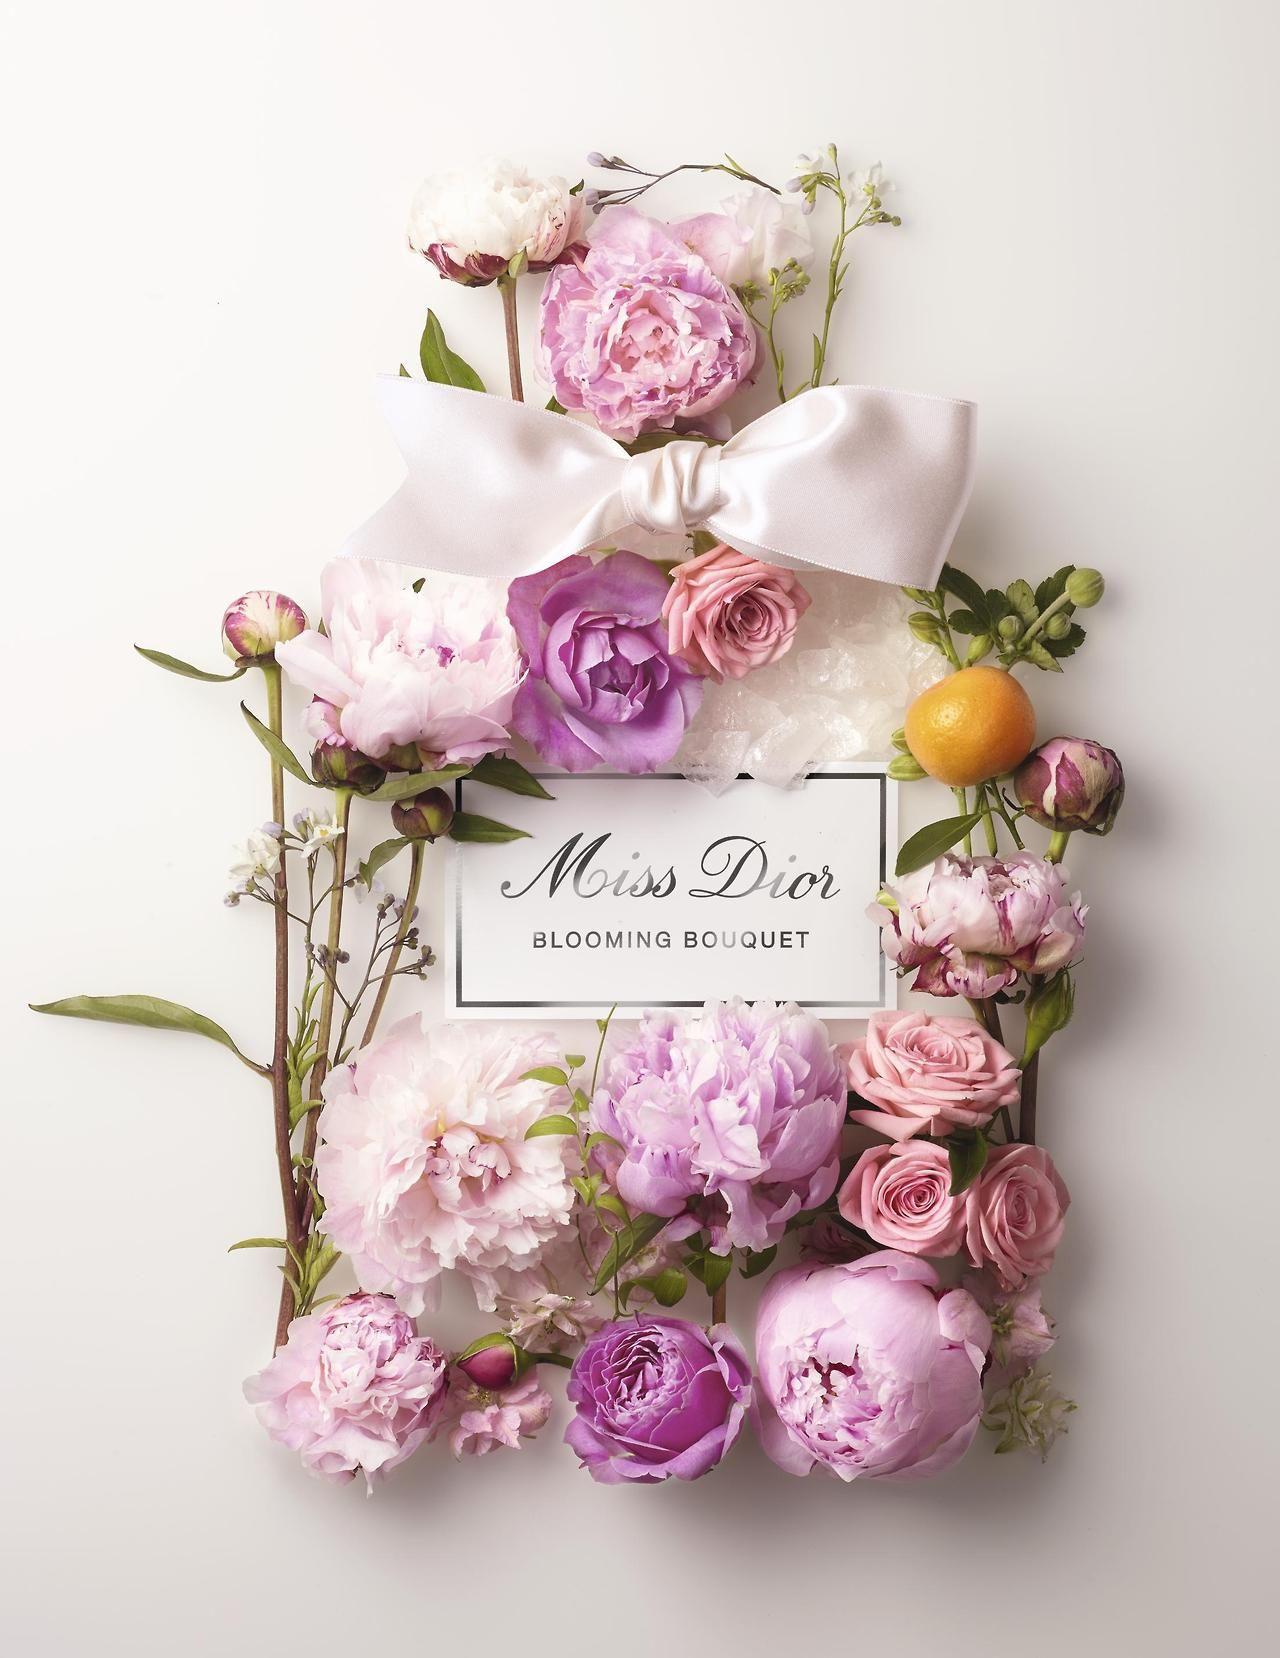 Miss dior blooming bouquet dior pinterest flowers bloom and miss dior blooming bouquet izmirmasajfo